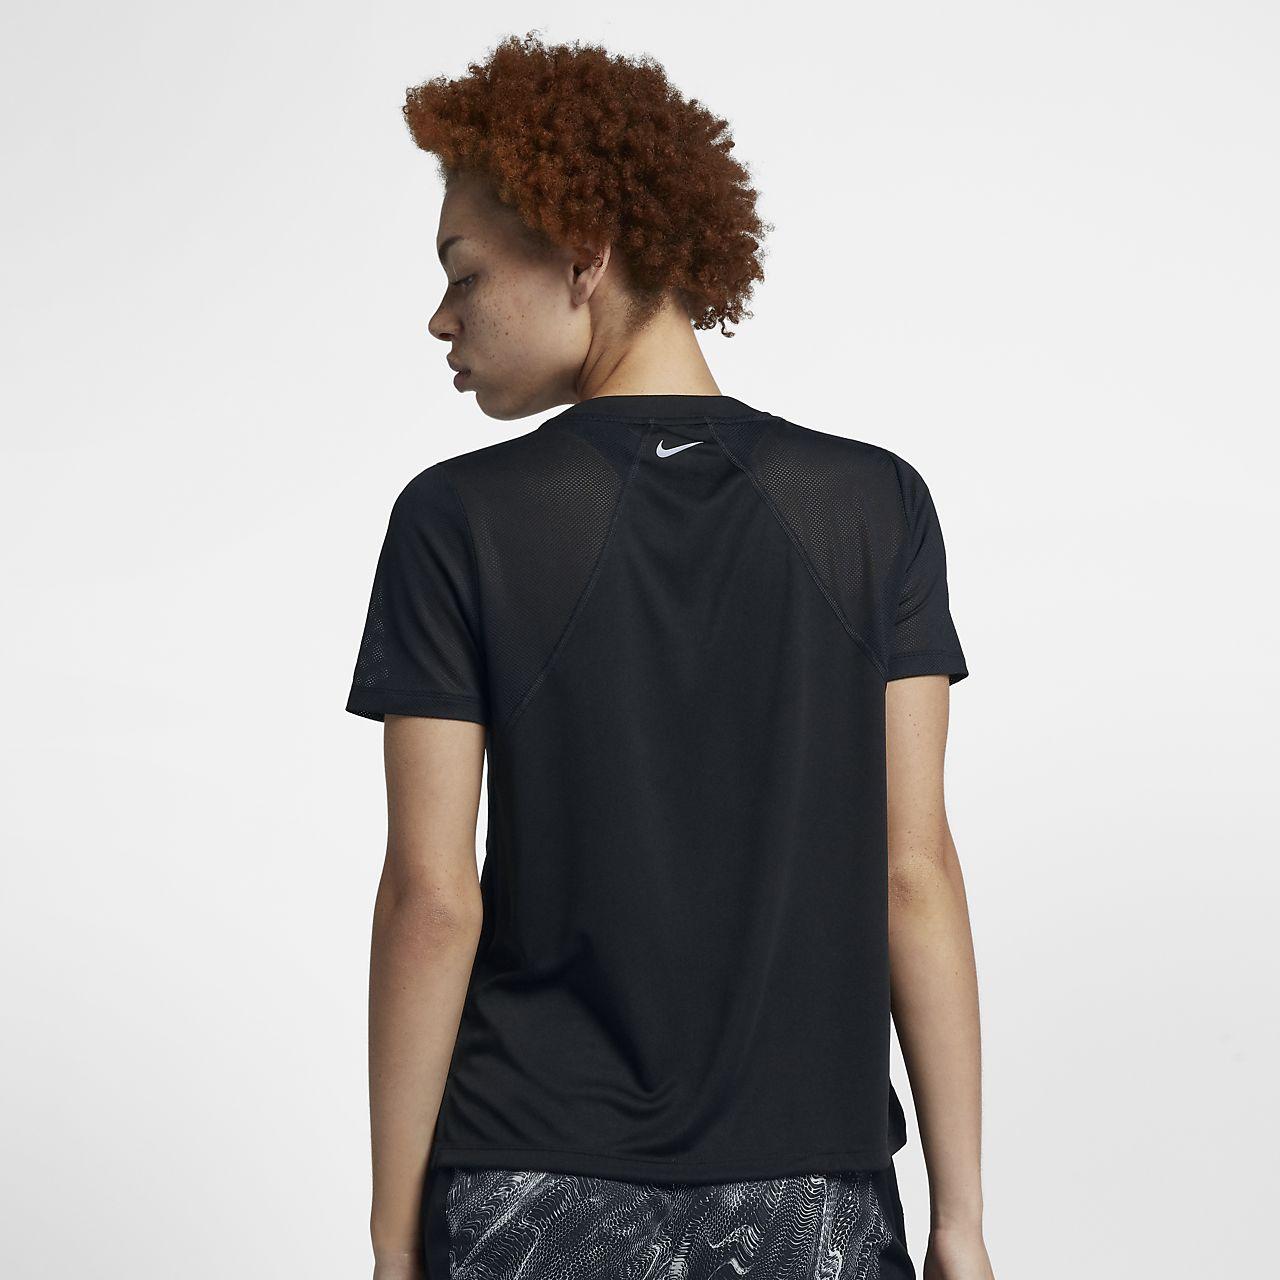 size 40 de1ec eb5c9 ... Nike Dri-FIT Miler Women s Short-Sleeve Running Top